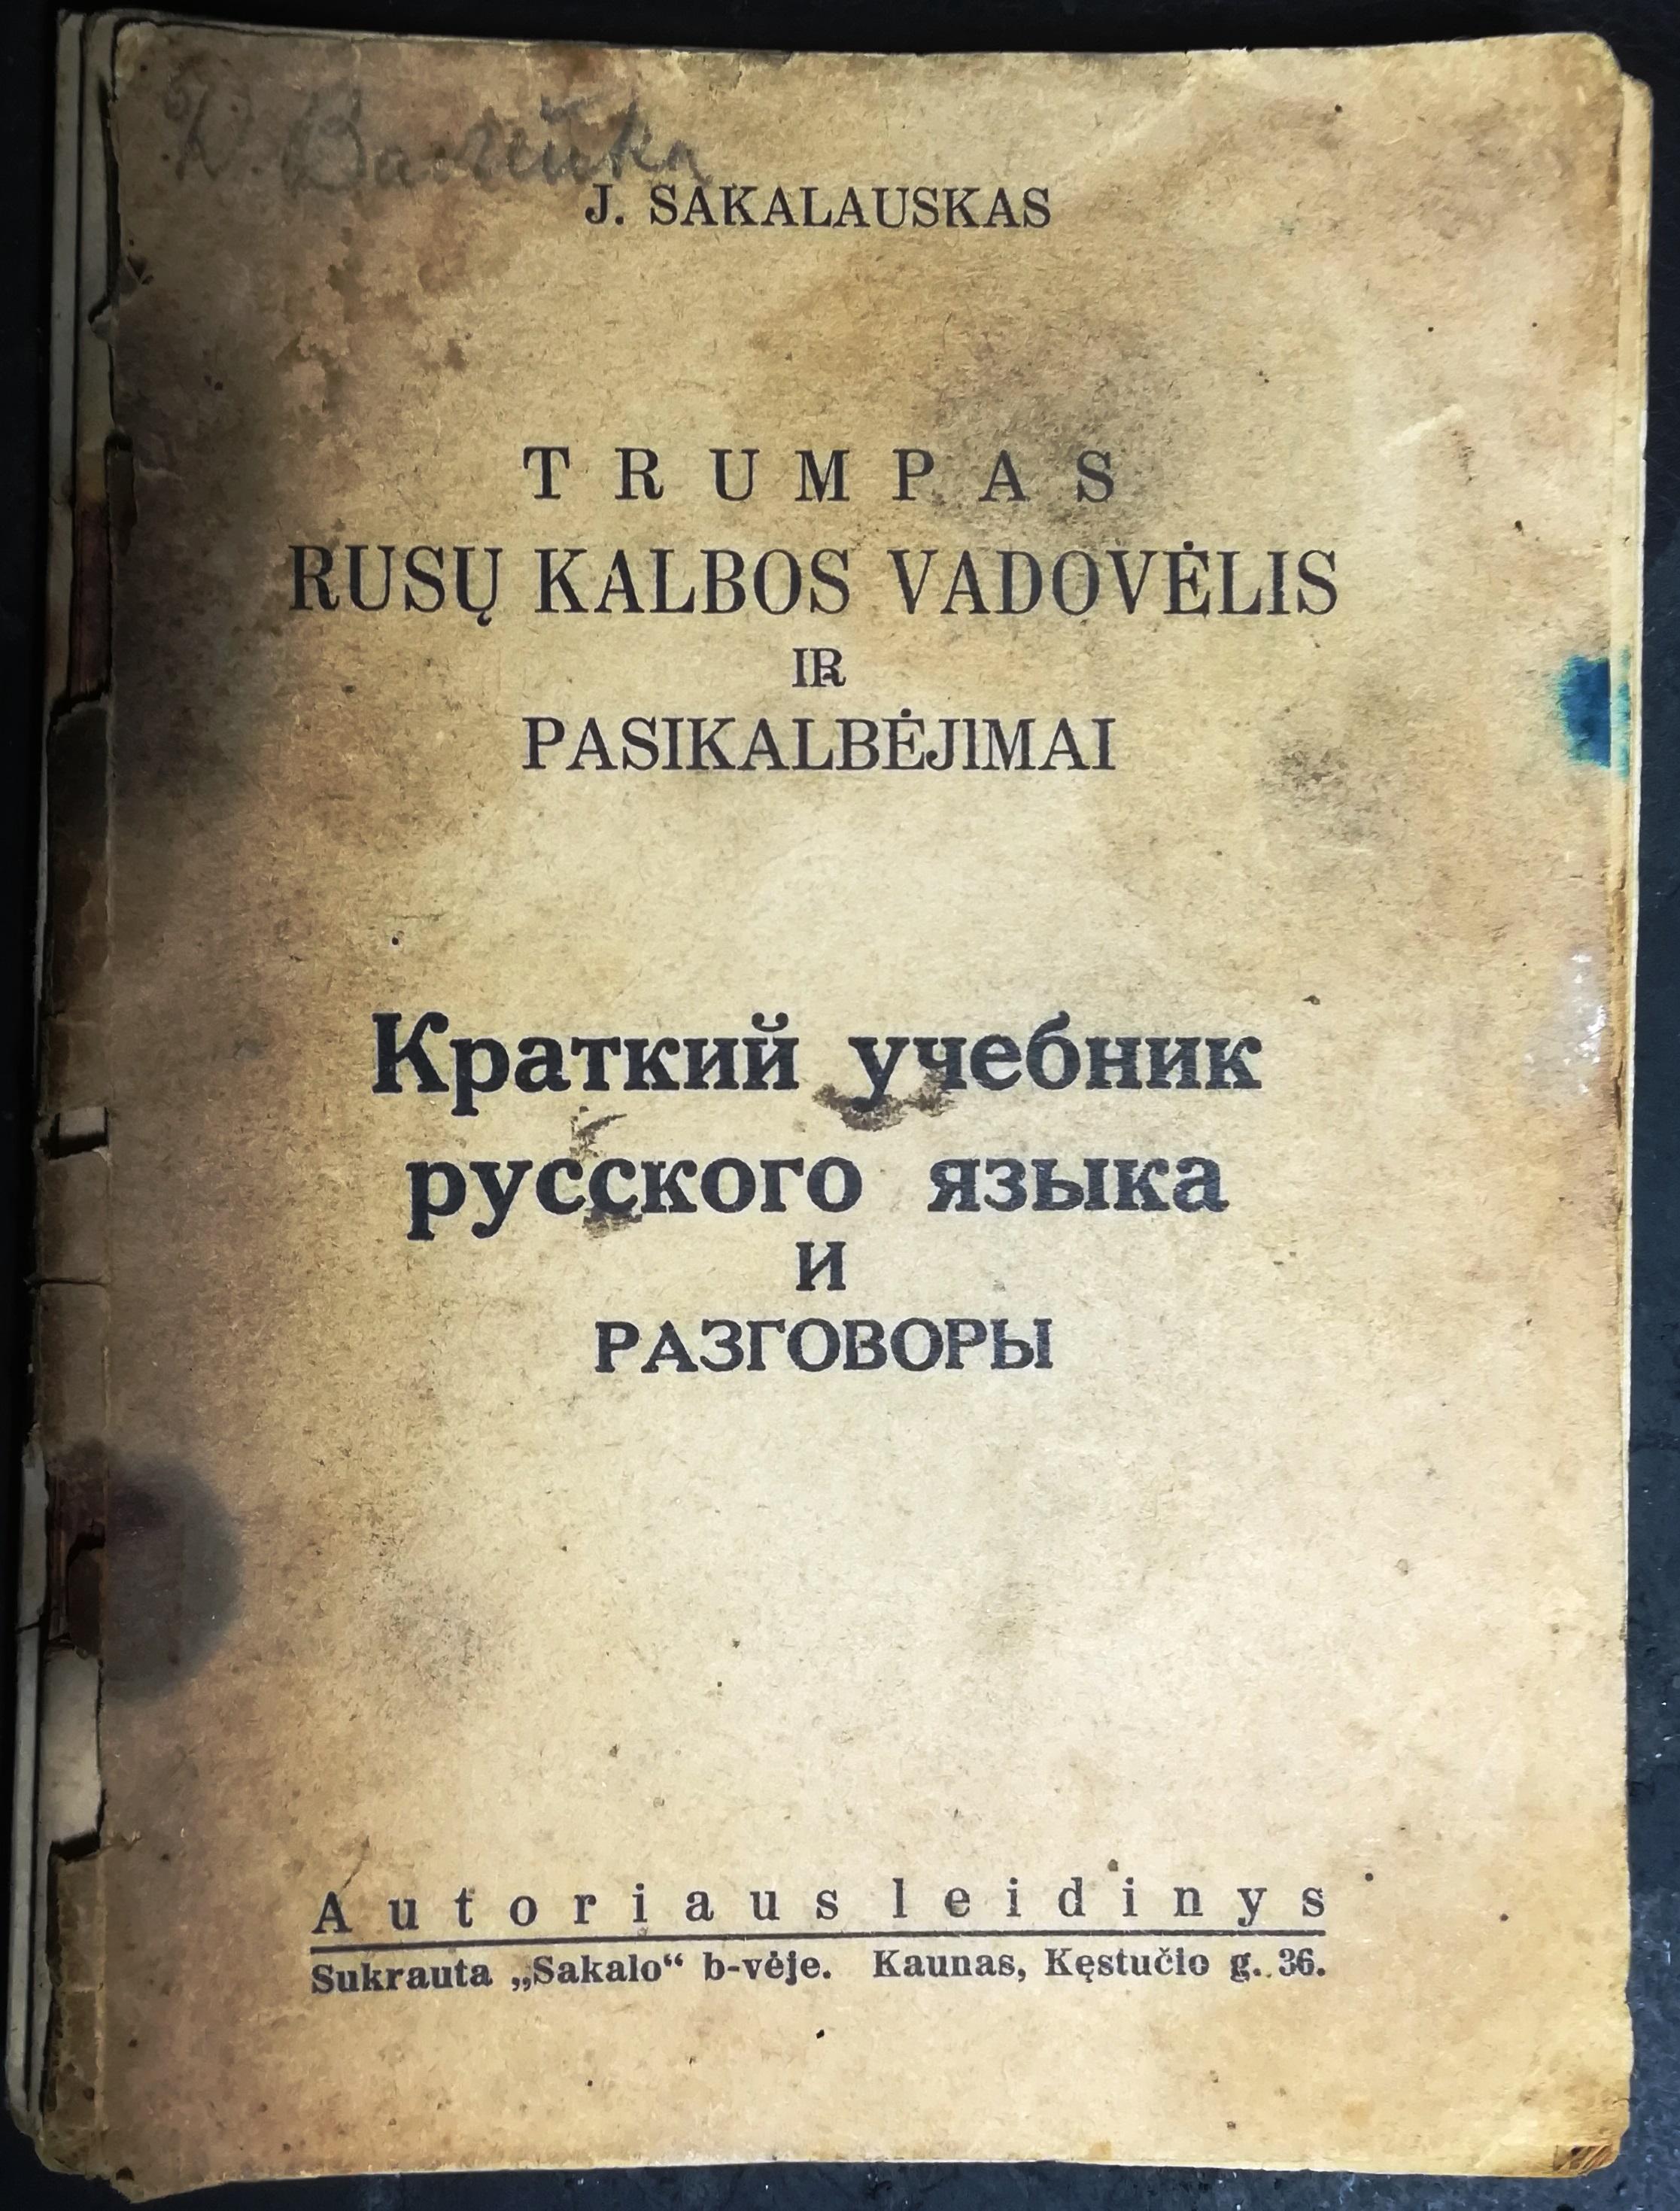 Rusų kalbos vadovėlis 1940 m. | L.Medelio nuotr.